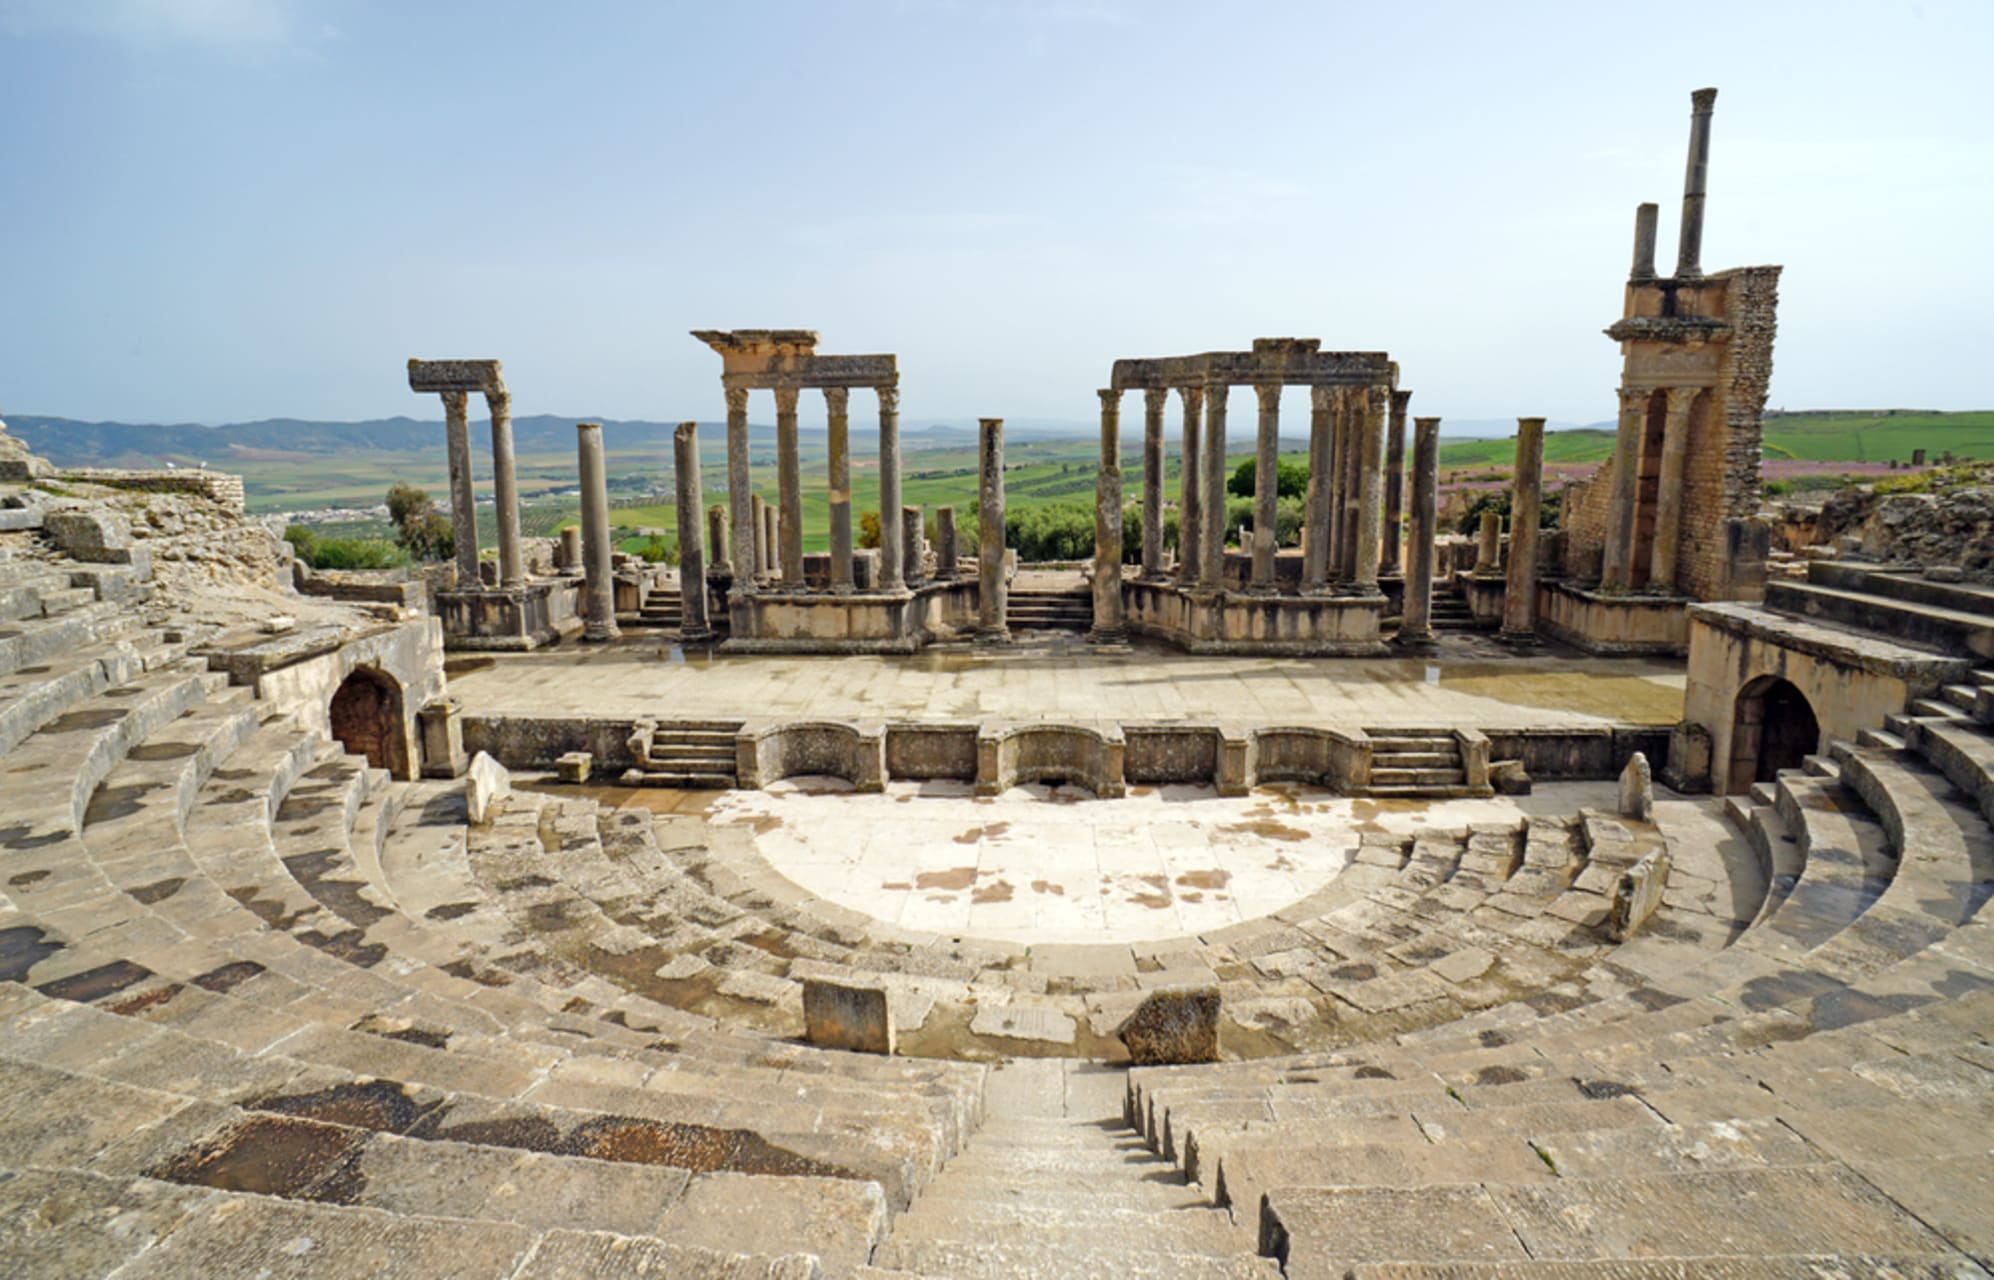 Dougga - Comprehensive Visit Of The Archaeological Site Of Dougga - UNESCO World Heritage